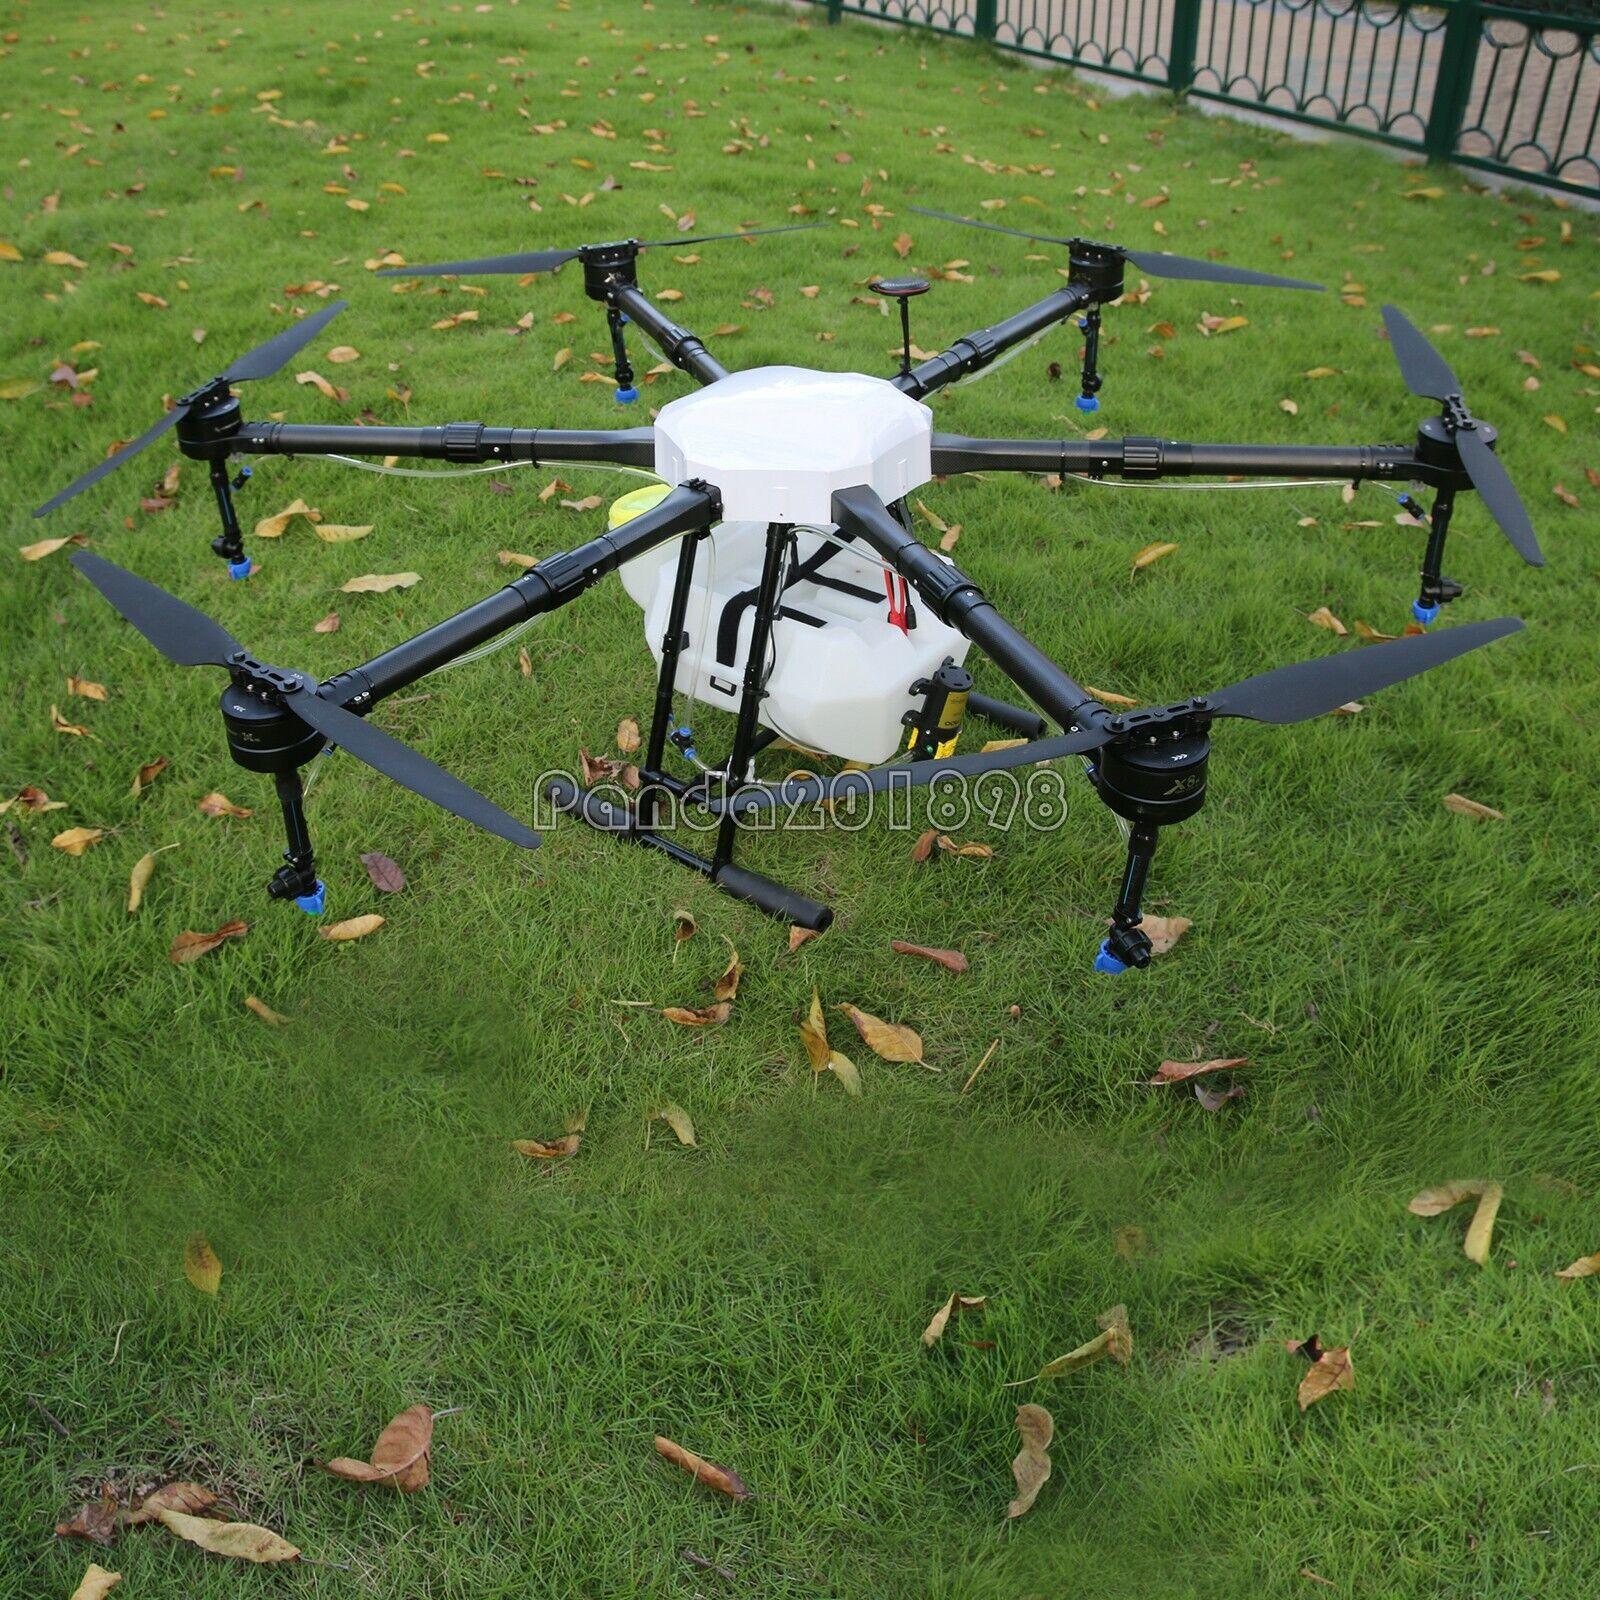 6-Axis AGRICOLTURA Drone 1600mm TELAIO Drone UAV capacità 16KG 15L PAN TANK Farm